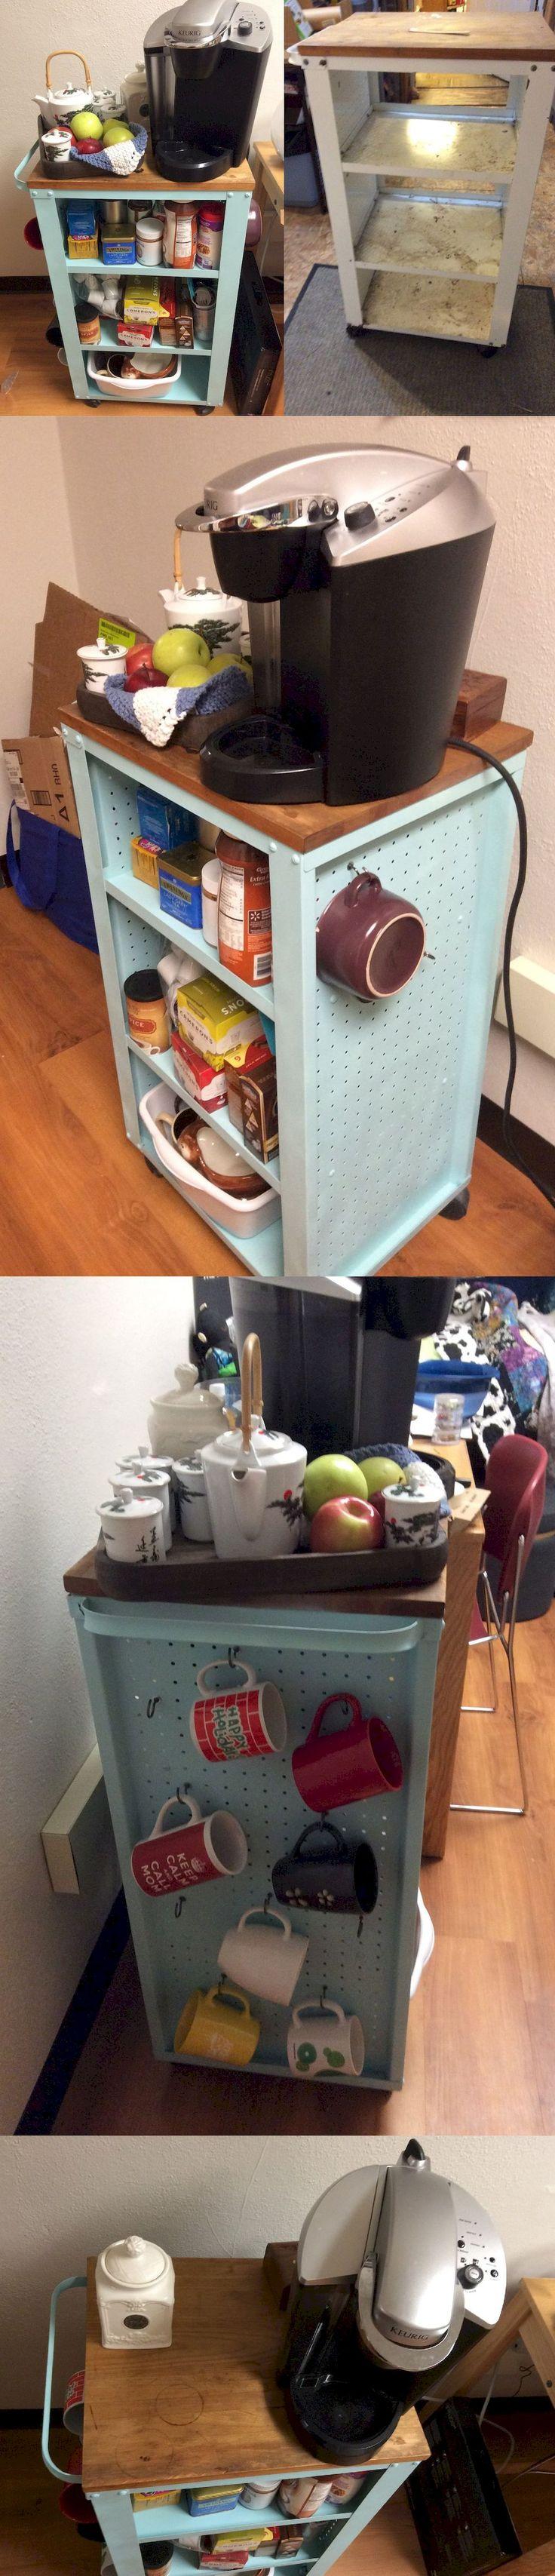 Nice 55 Cool Dorm Room Decorating Ideas https://homstuff.com/2017/10/14/55-cool-dorm-room-decorating-ideas/